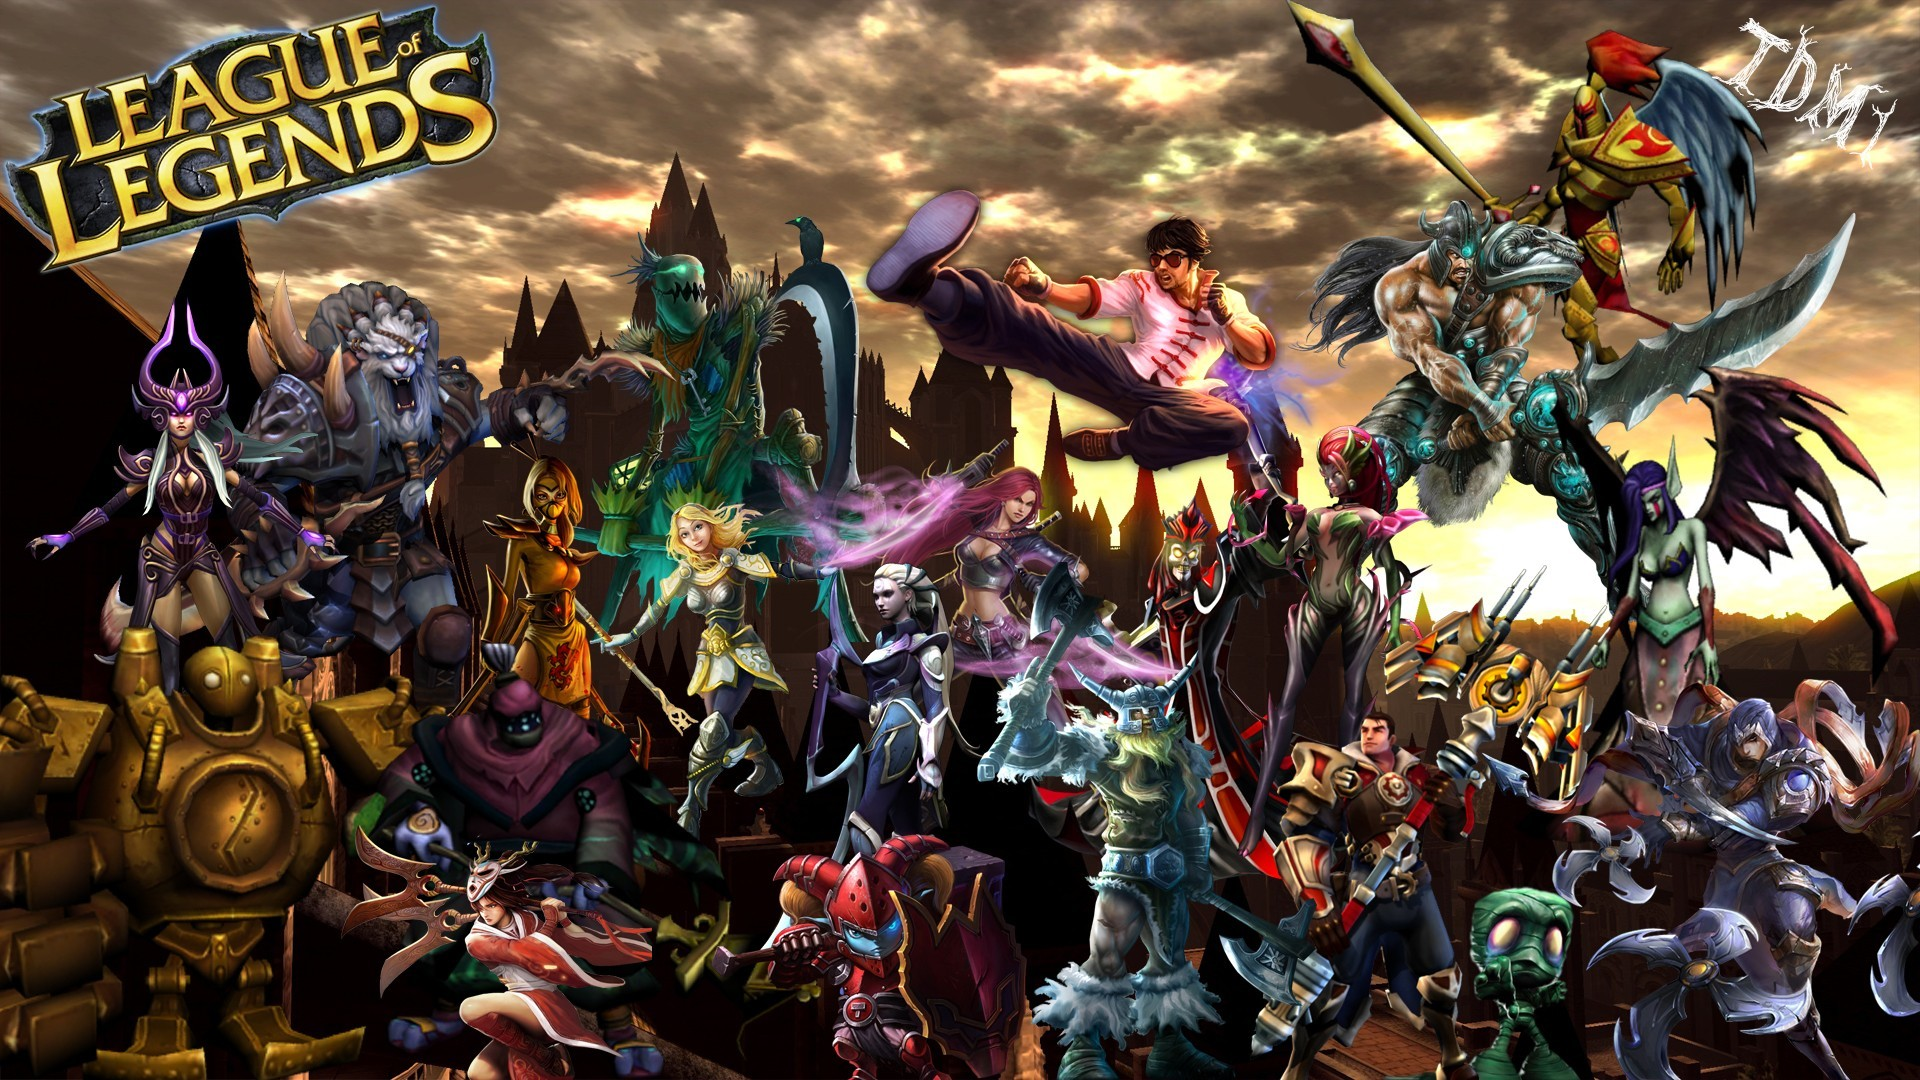 Ultra HD K League Of Legends Wallpapers HD Desktop Backgrounds